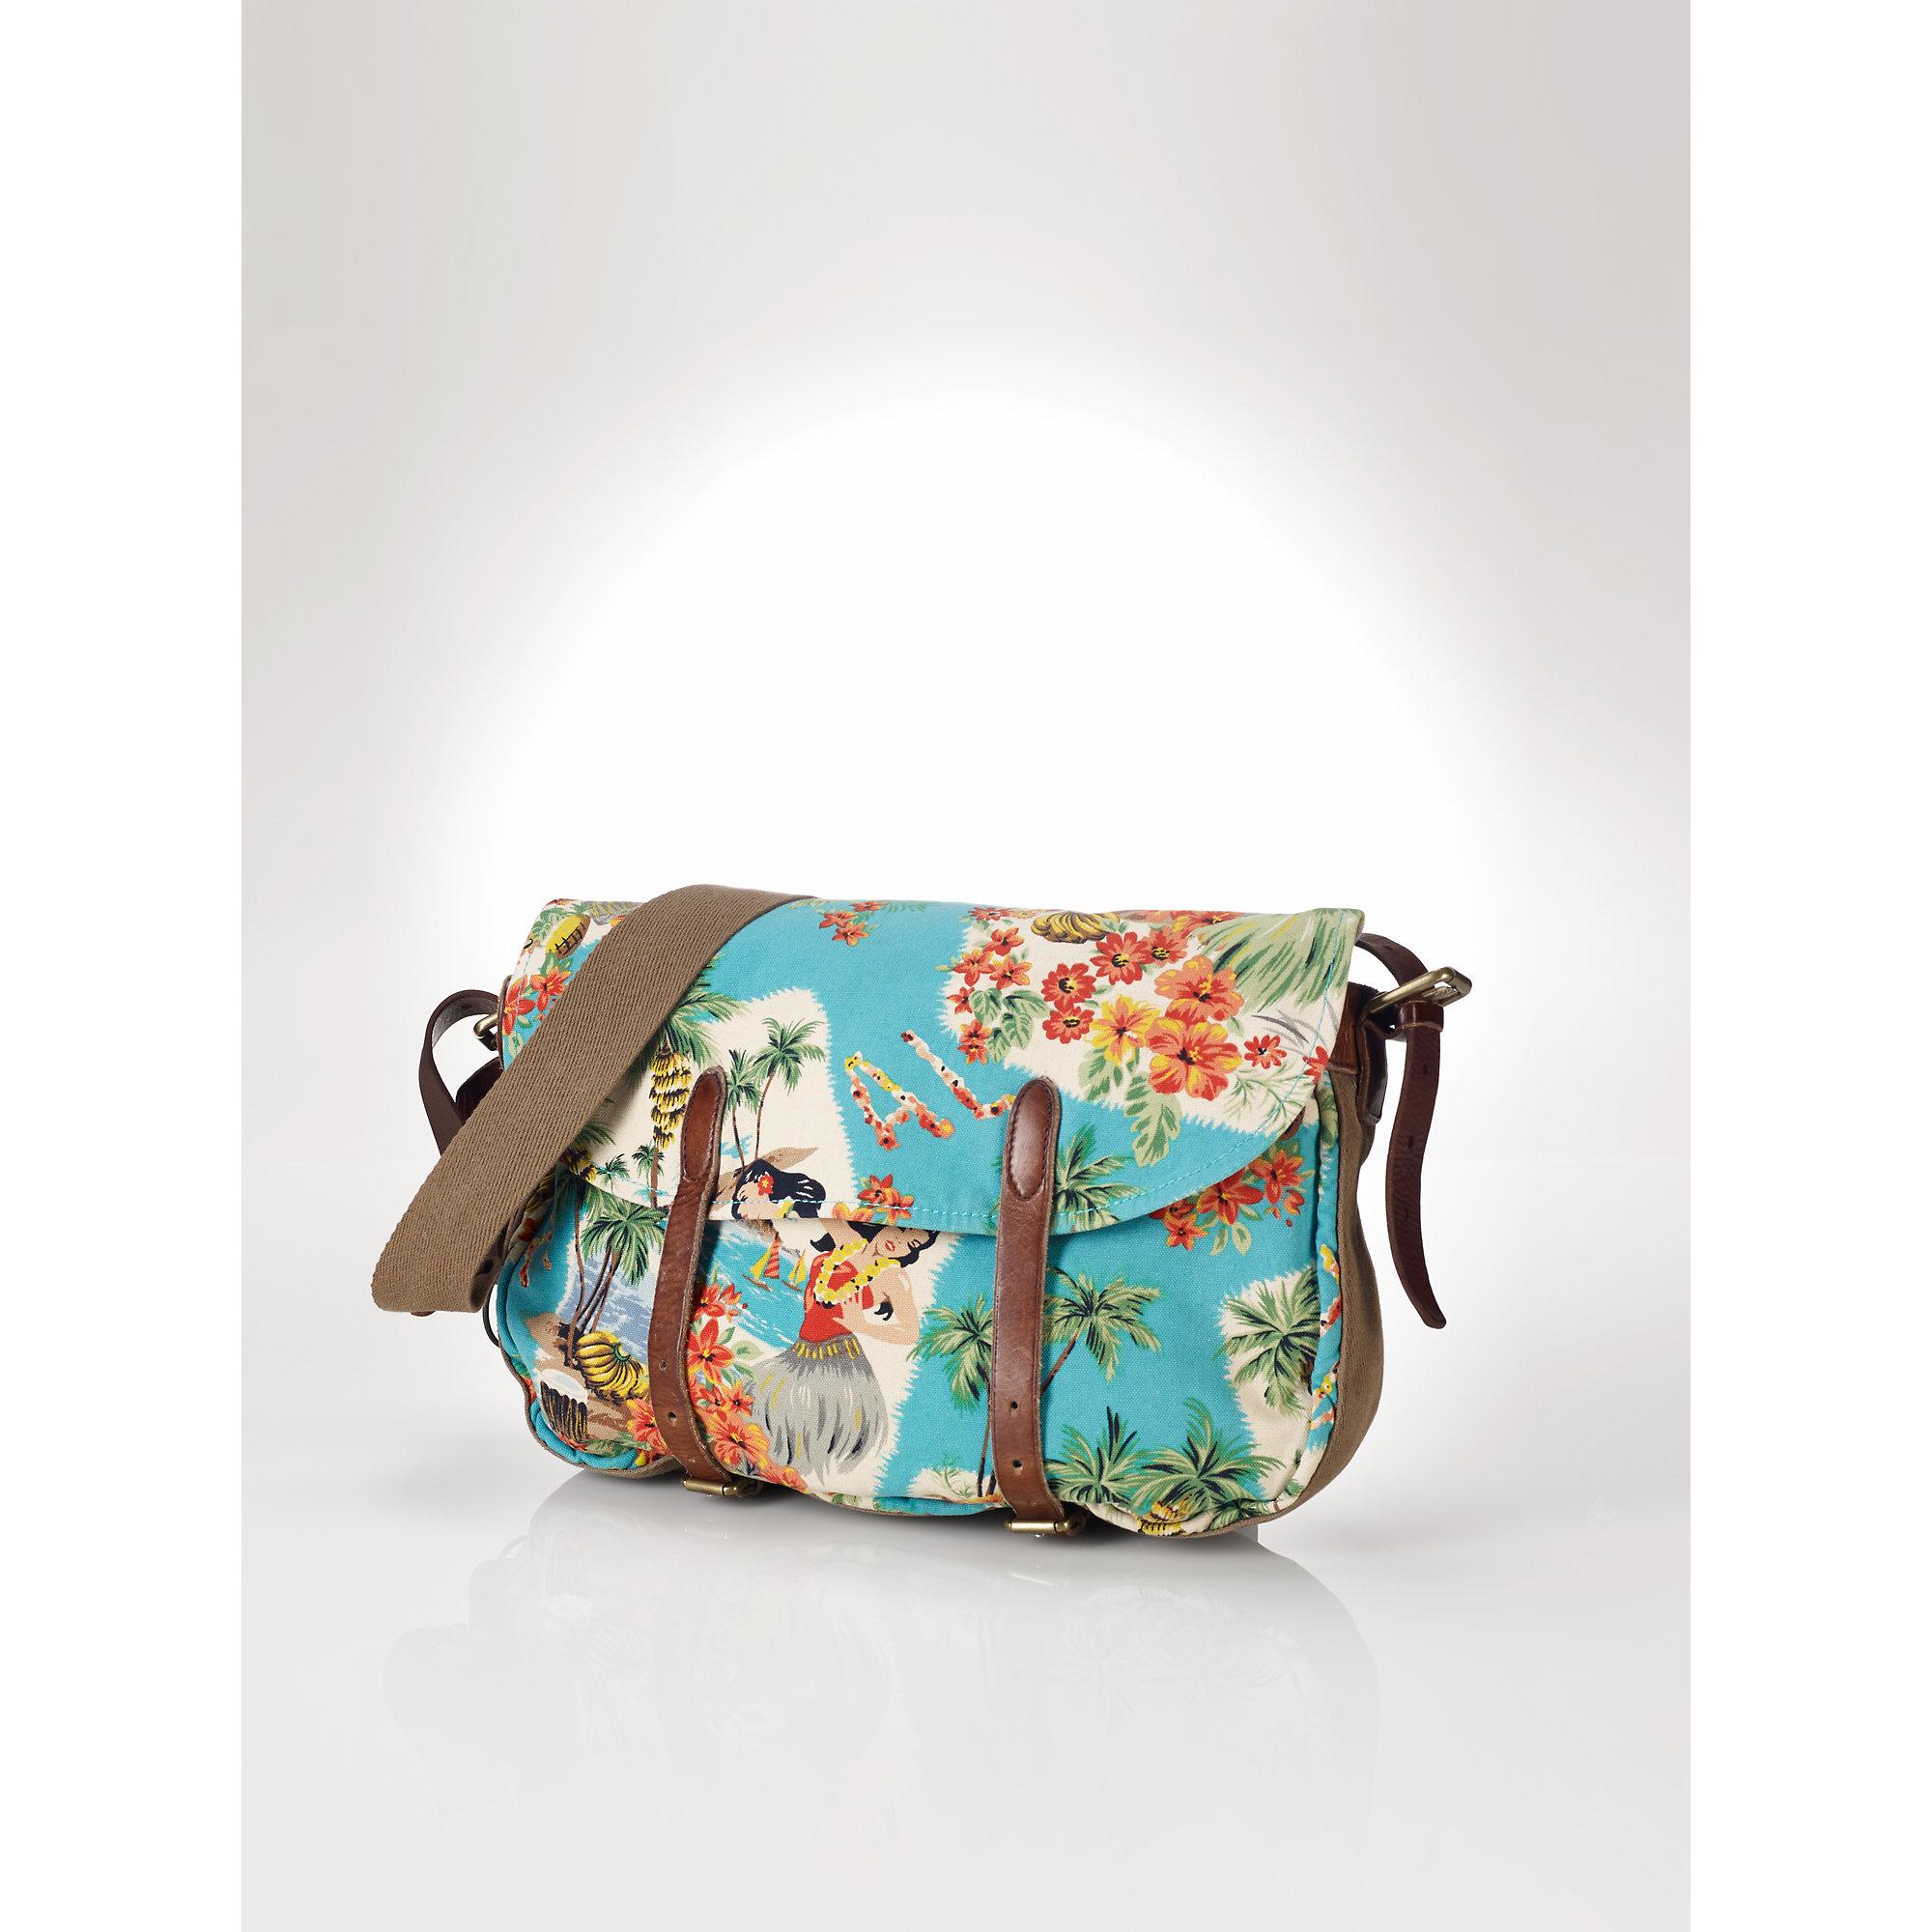 5edc12cd07 ... best price lyst polo ralph lauren floral canvas bag f0dcc 351dd